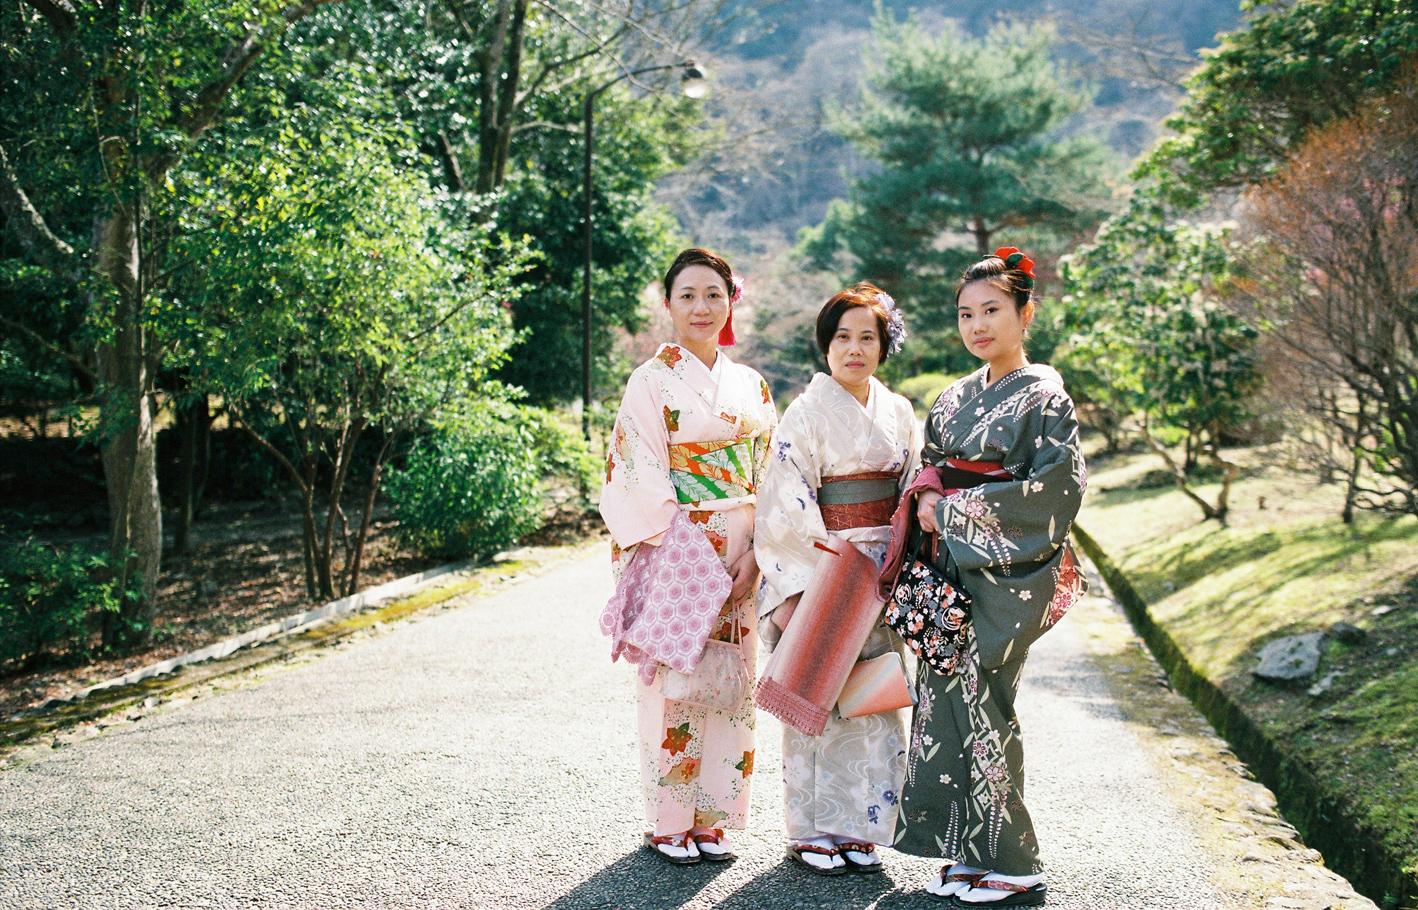 015-kyoto-arashiyama-sophie-baker-photography